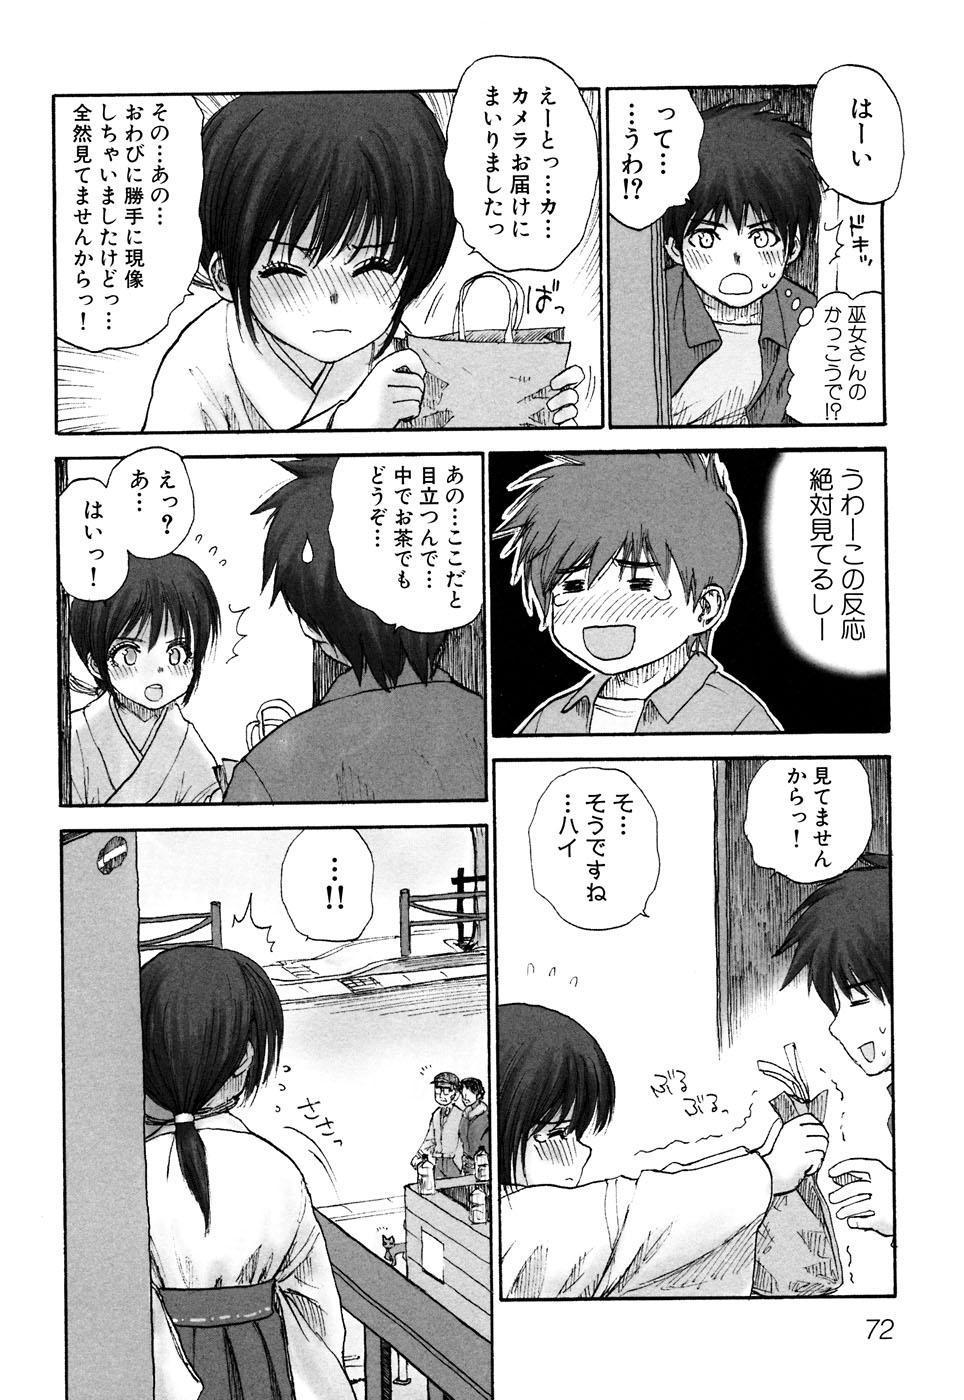 Fechikko VS Series ROUND.2 Miko San VS Maid San 74